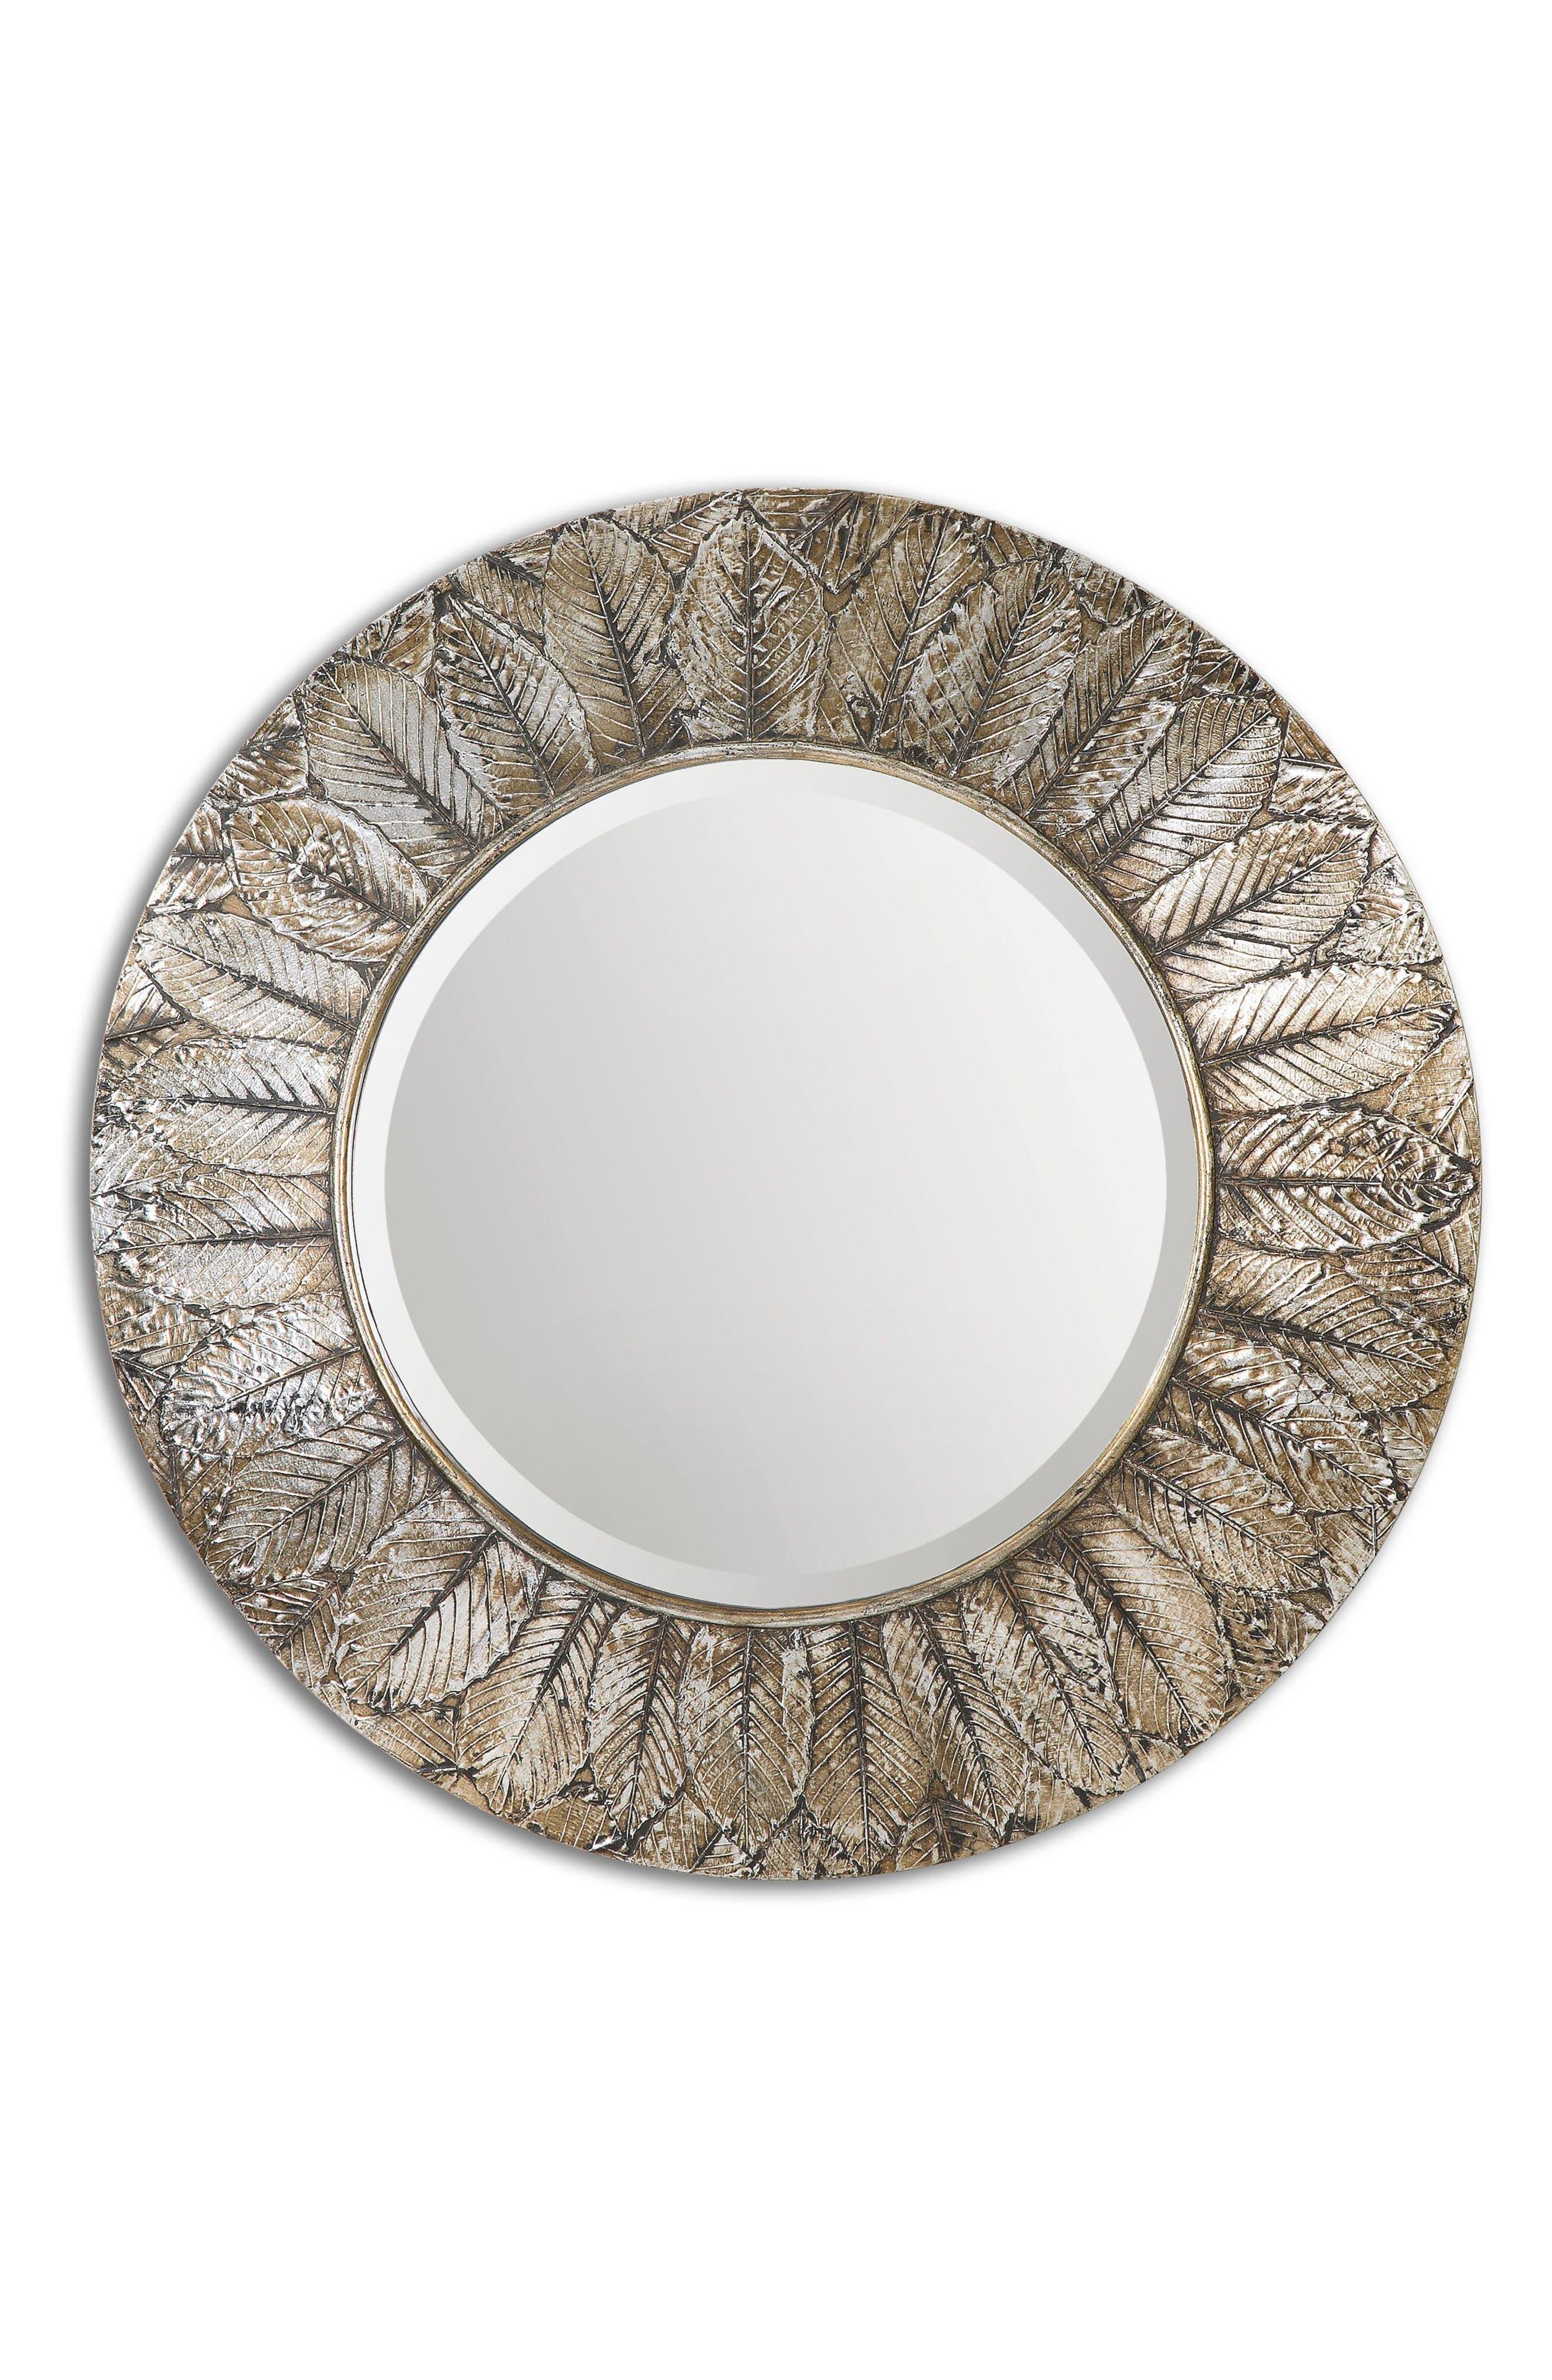 Main Image - Uttermost Foliage Wall Mirror